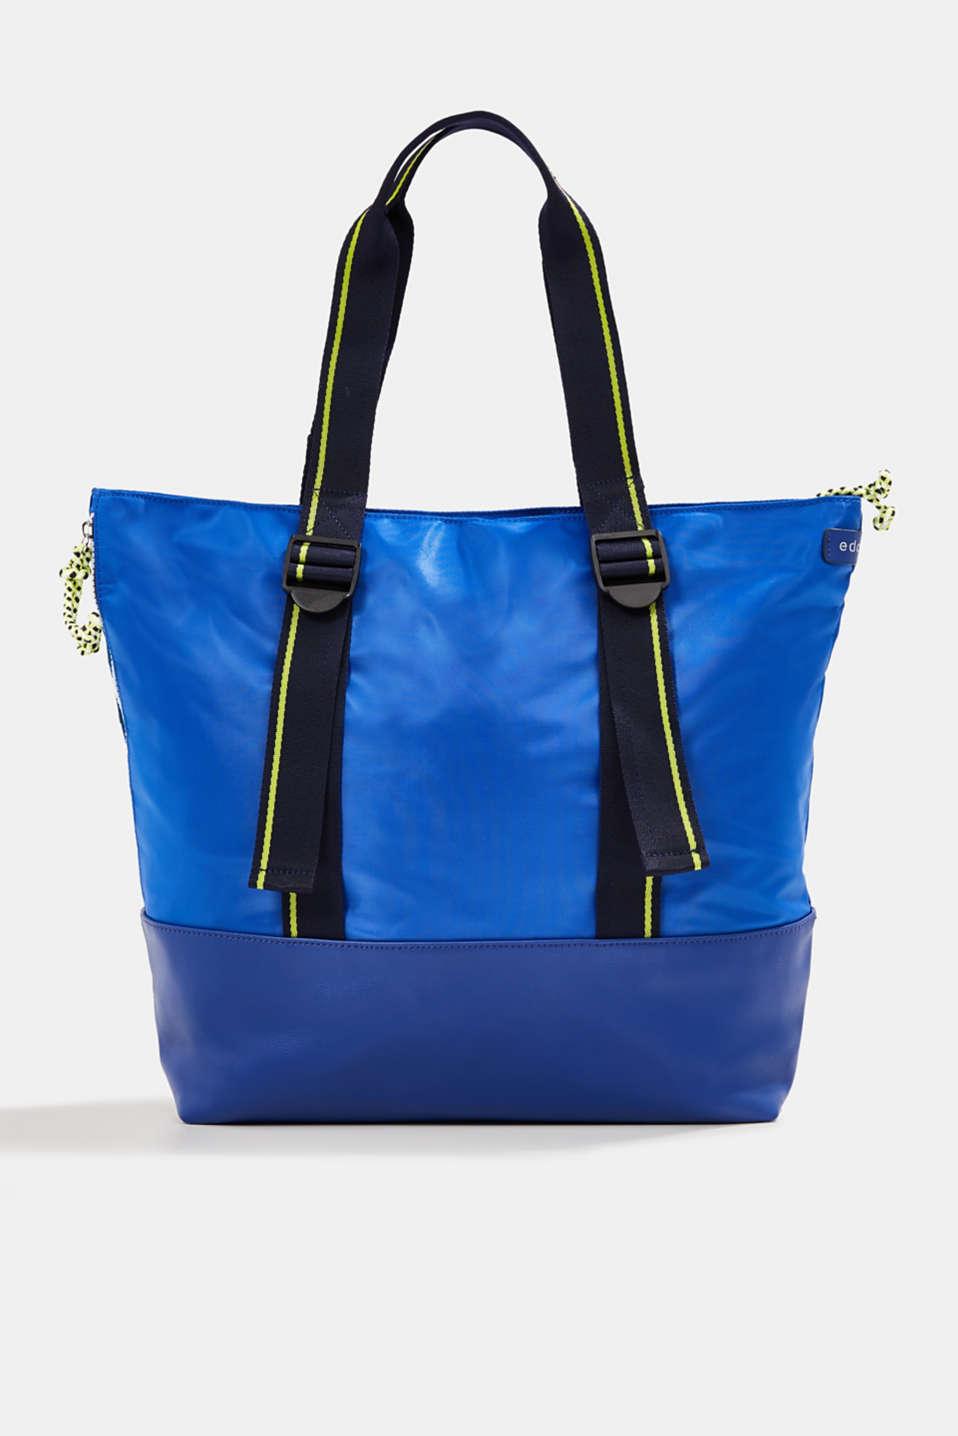 Nylon tote bag, BRIGHT BLUE, detail image number 0